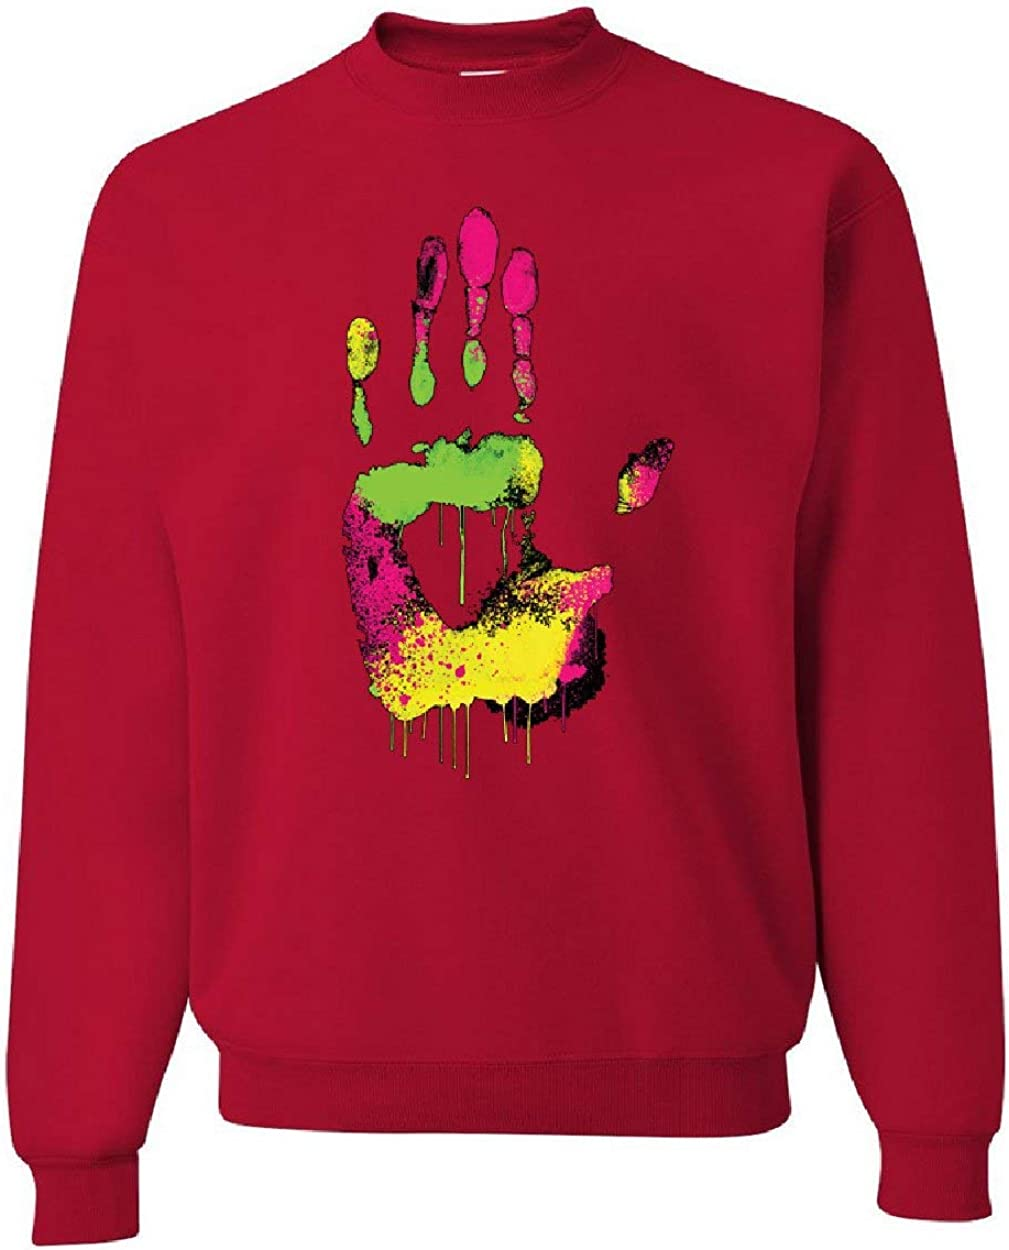 Tee Hunt High Five Sweatshirt Melting Neon Dripping Hand Positive Multicolor Sweater